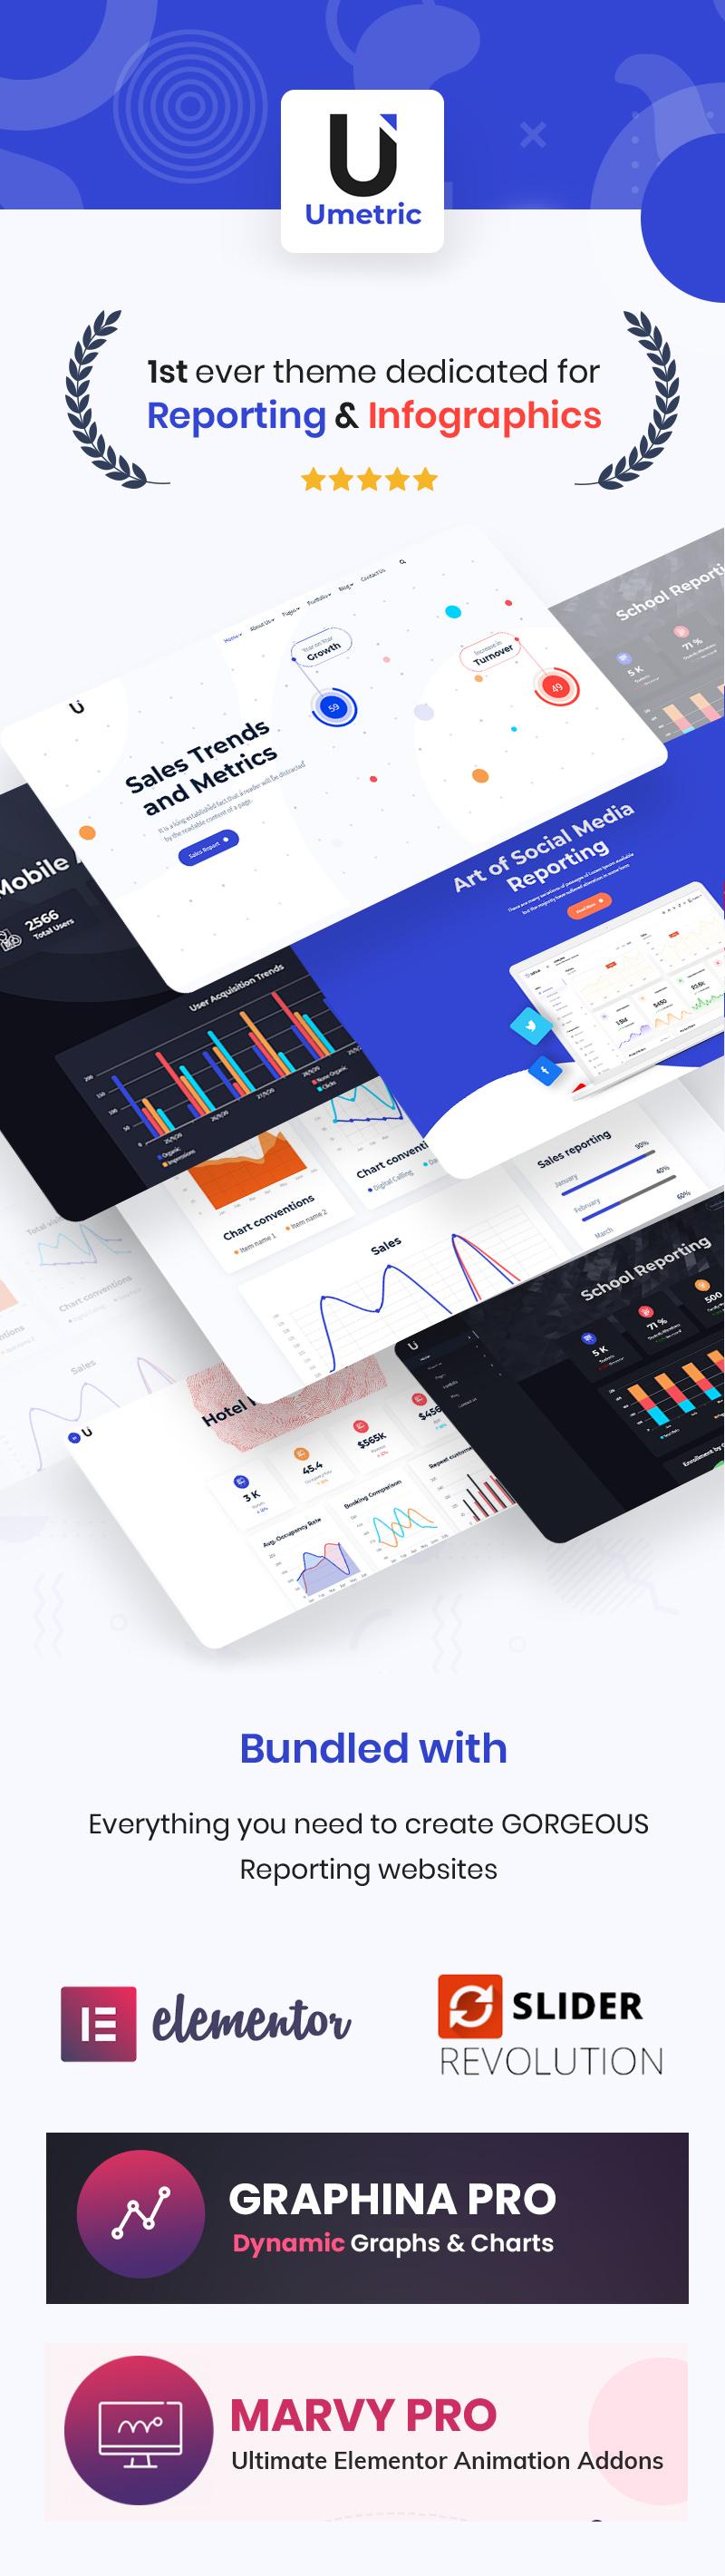 WordPress Dashboard Reporting and Infographic Theme | Umetric | Iqonic Design wordpress dashboard reporting and infographic theme Umetric m11